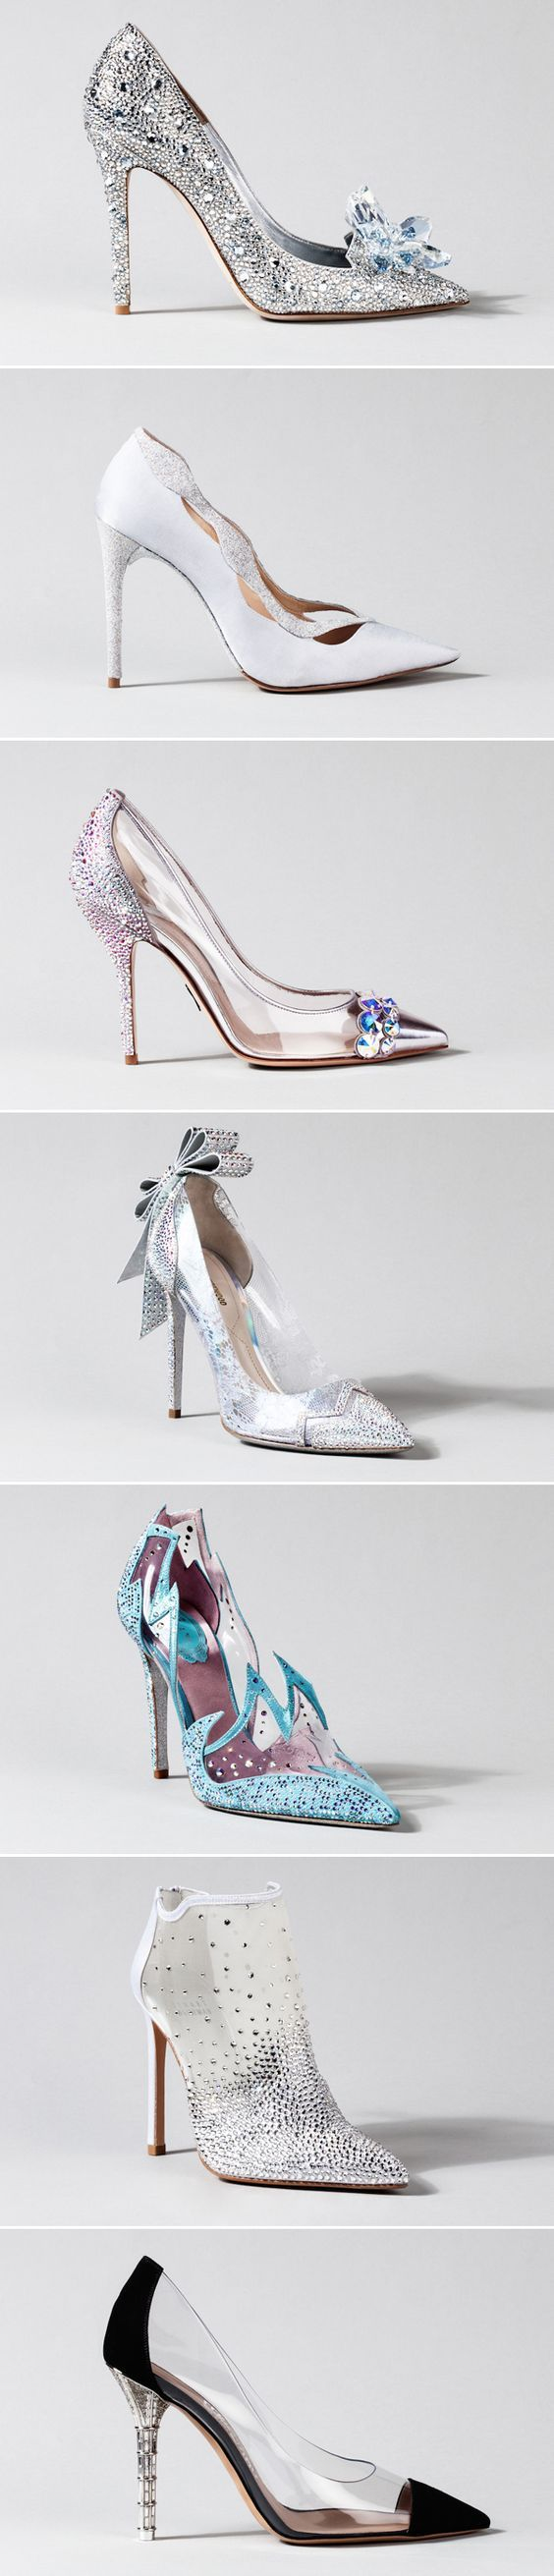 Cinderella Inspired Wedding Shoes / http://www.himisspuff.com/pretty-wedding-shoes/4/